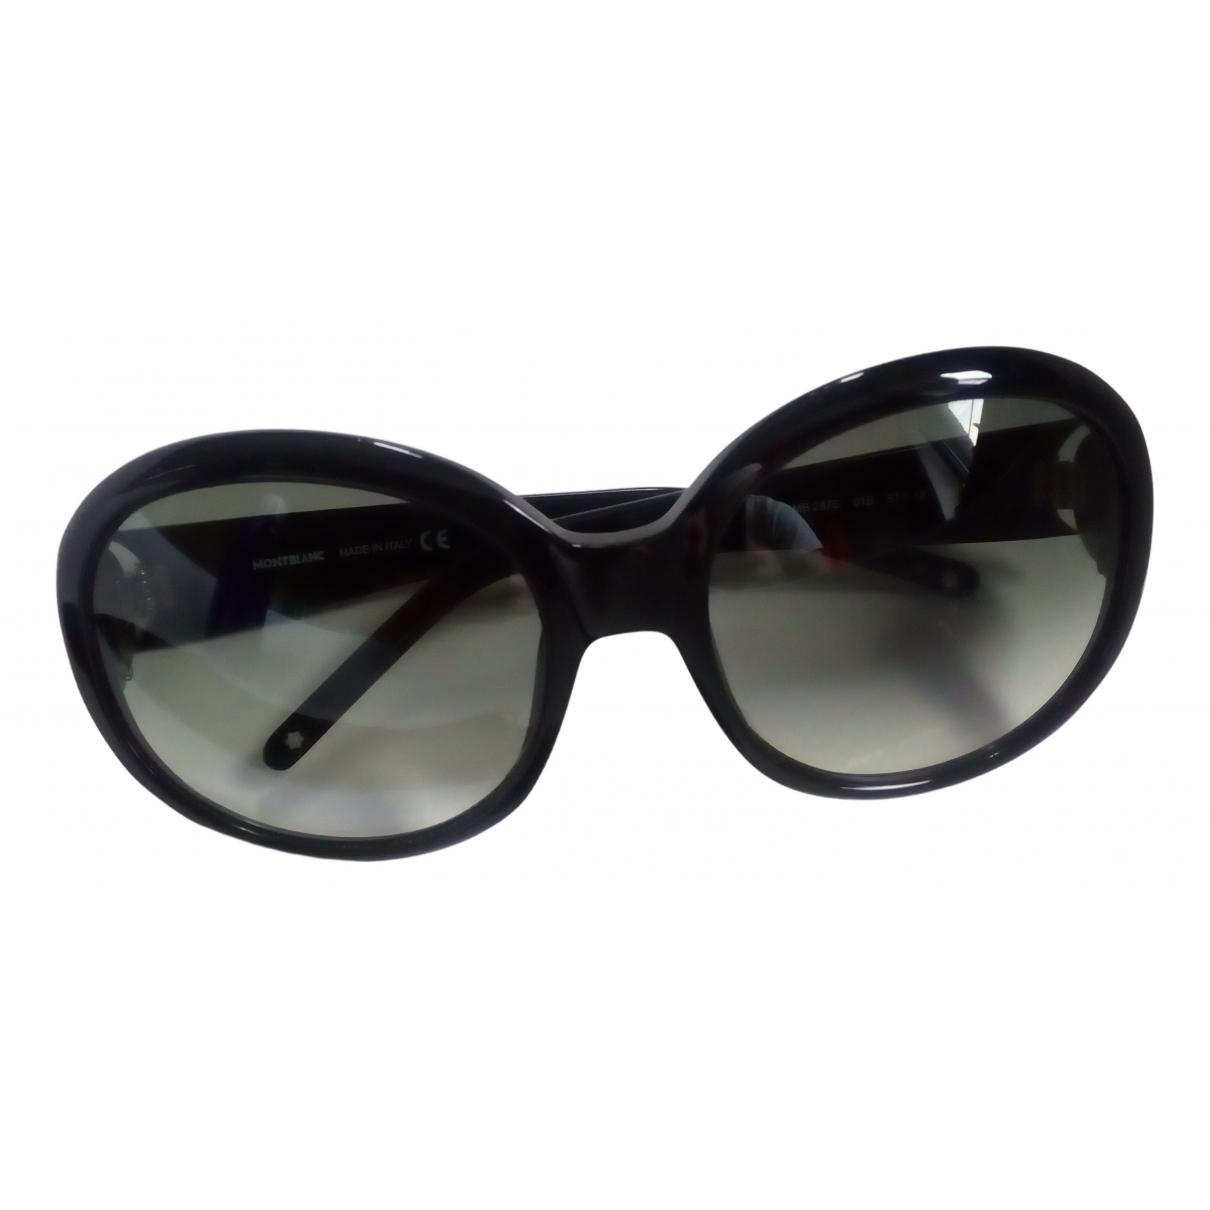 Gafas oversize Montblanc